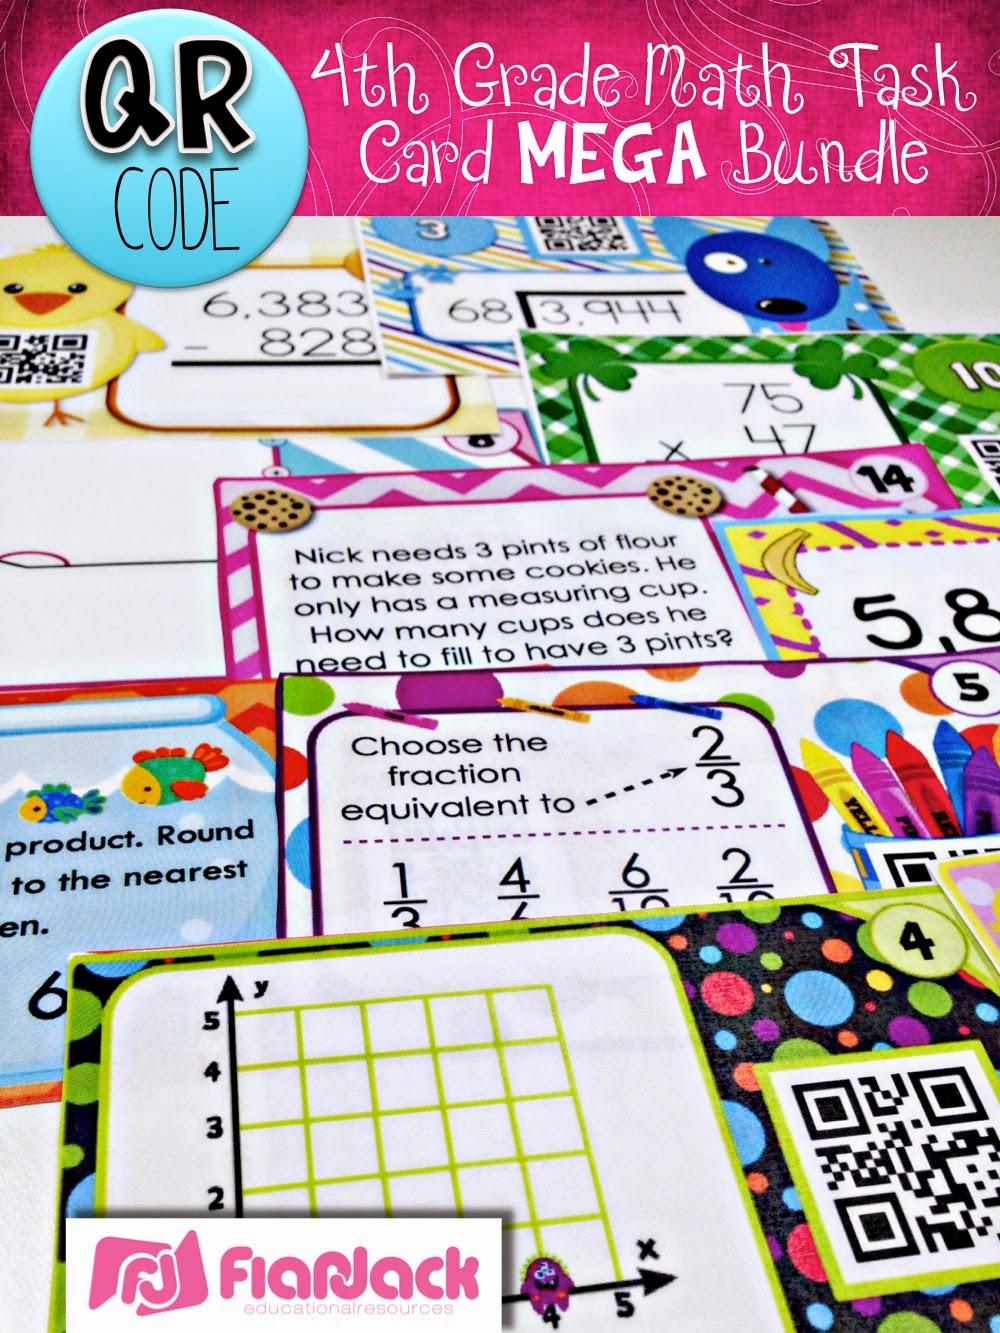 http://www.teacherspayteachers.com/Product/4th-Grade-Math-QR-Code-Task-Cards-MEGA-Bundle-1367254